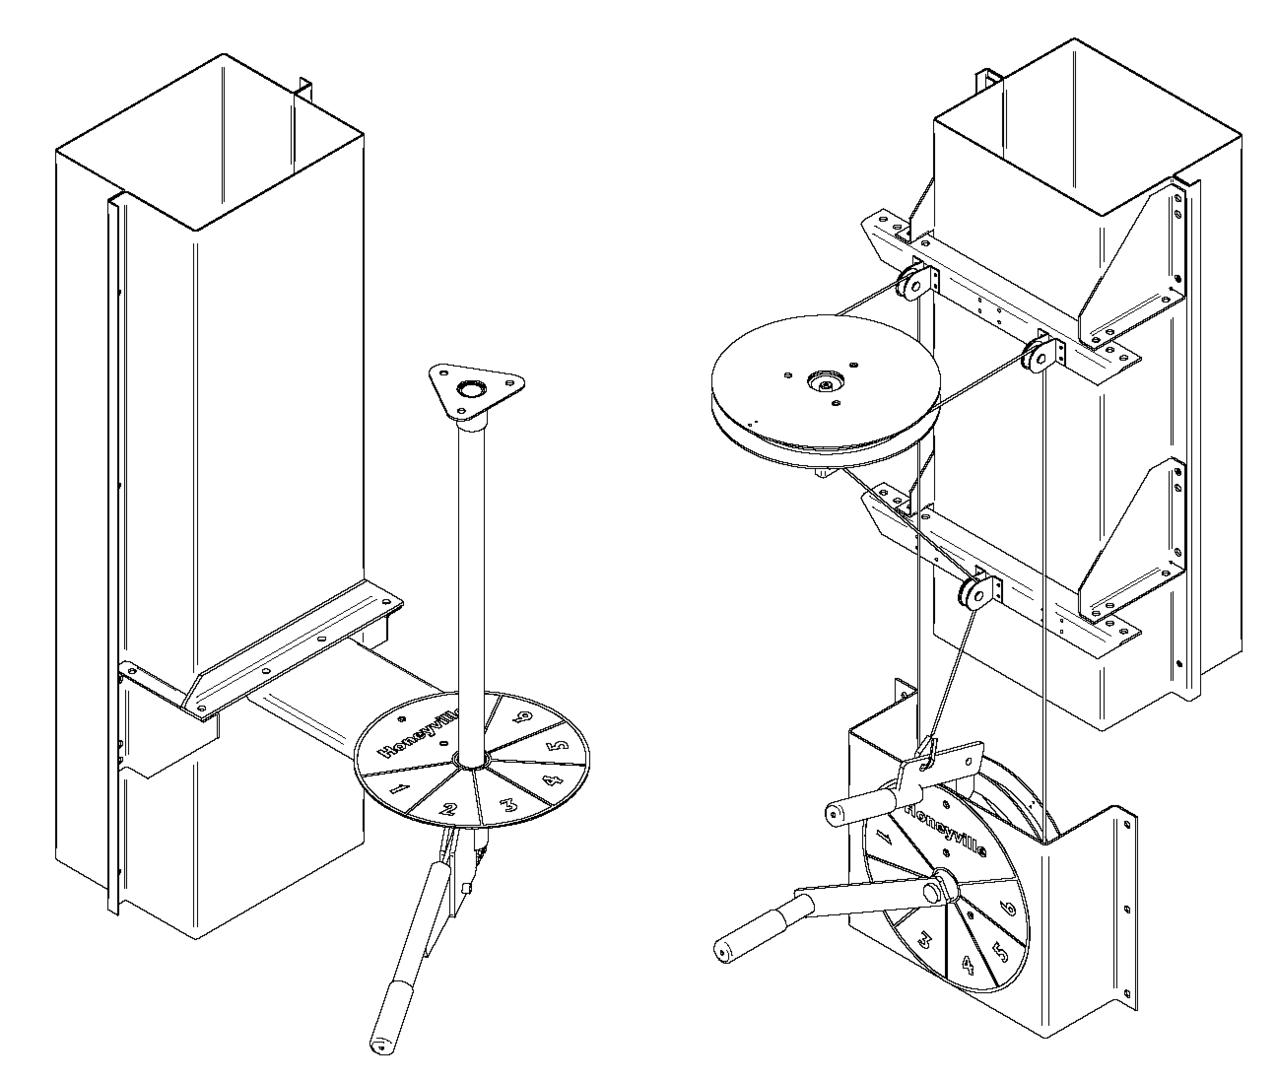 grain kernel diagram 6 pin mini din leg wiring experts